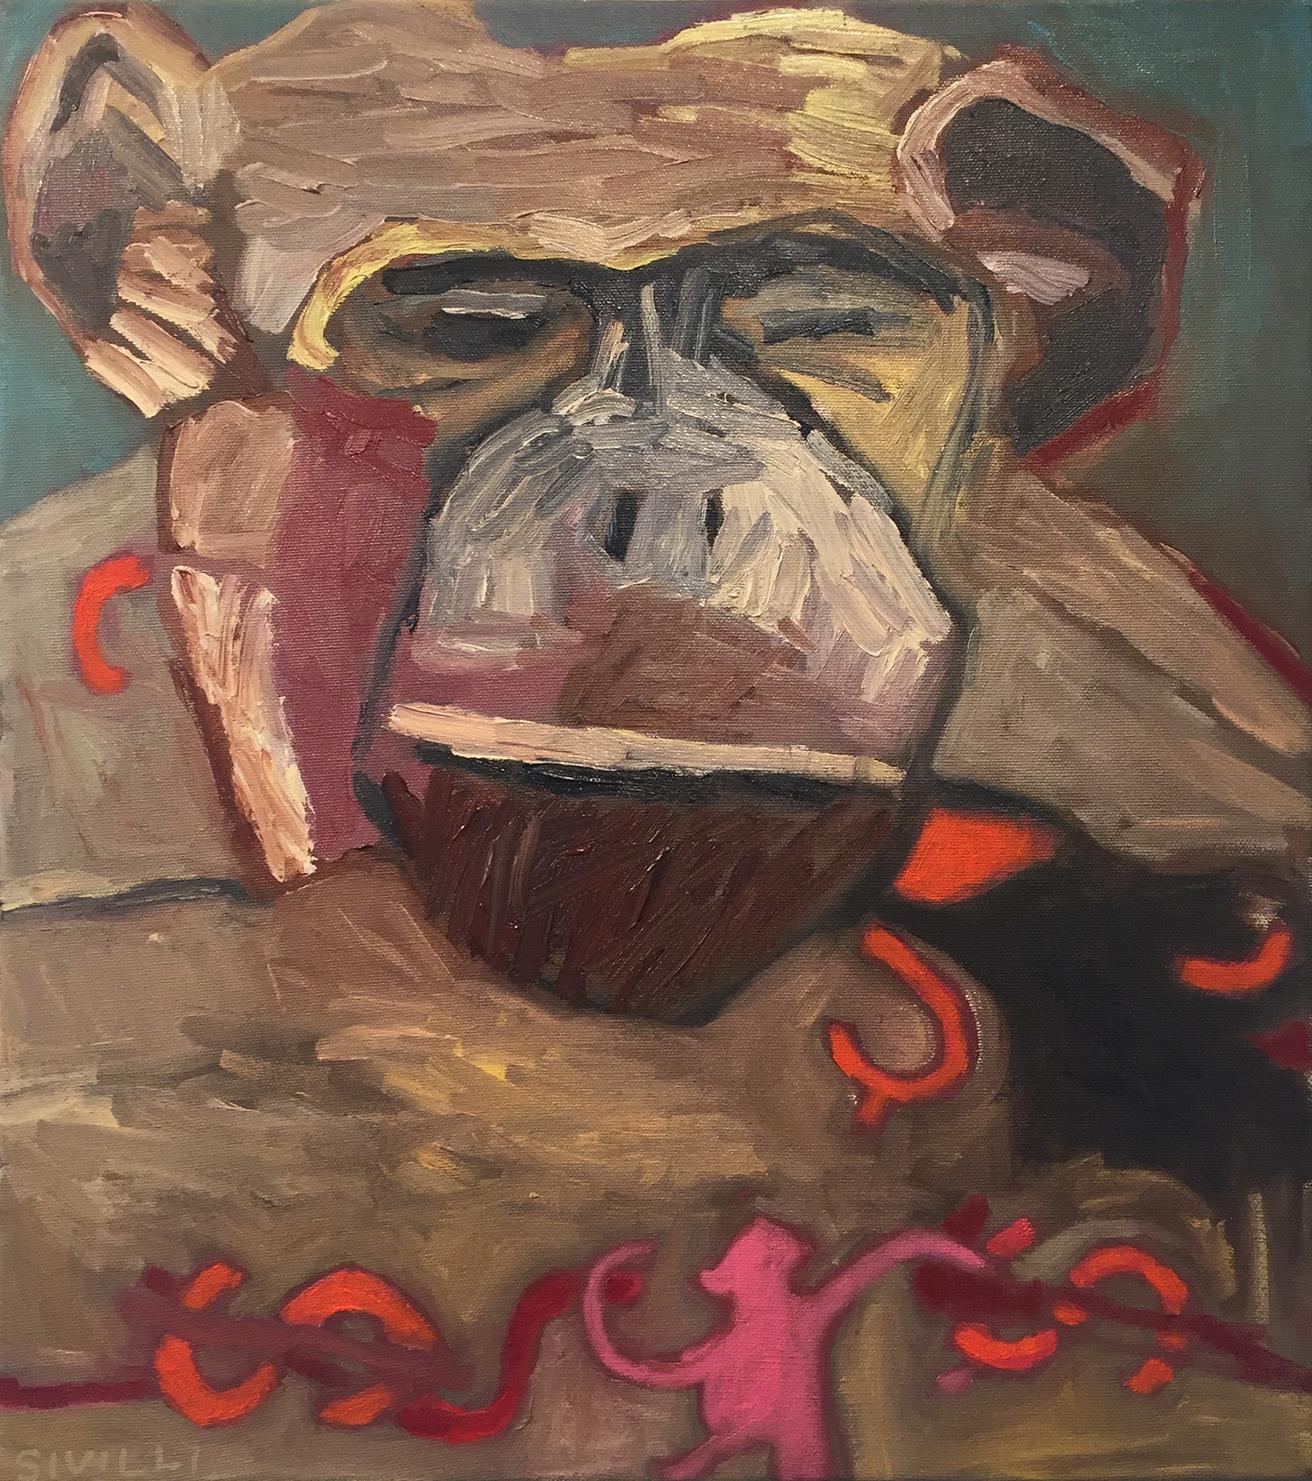 val-sivilli-•-chimp-5-•-oil-on-canvas-•-18-x-16-x-1-inches • 2018